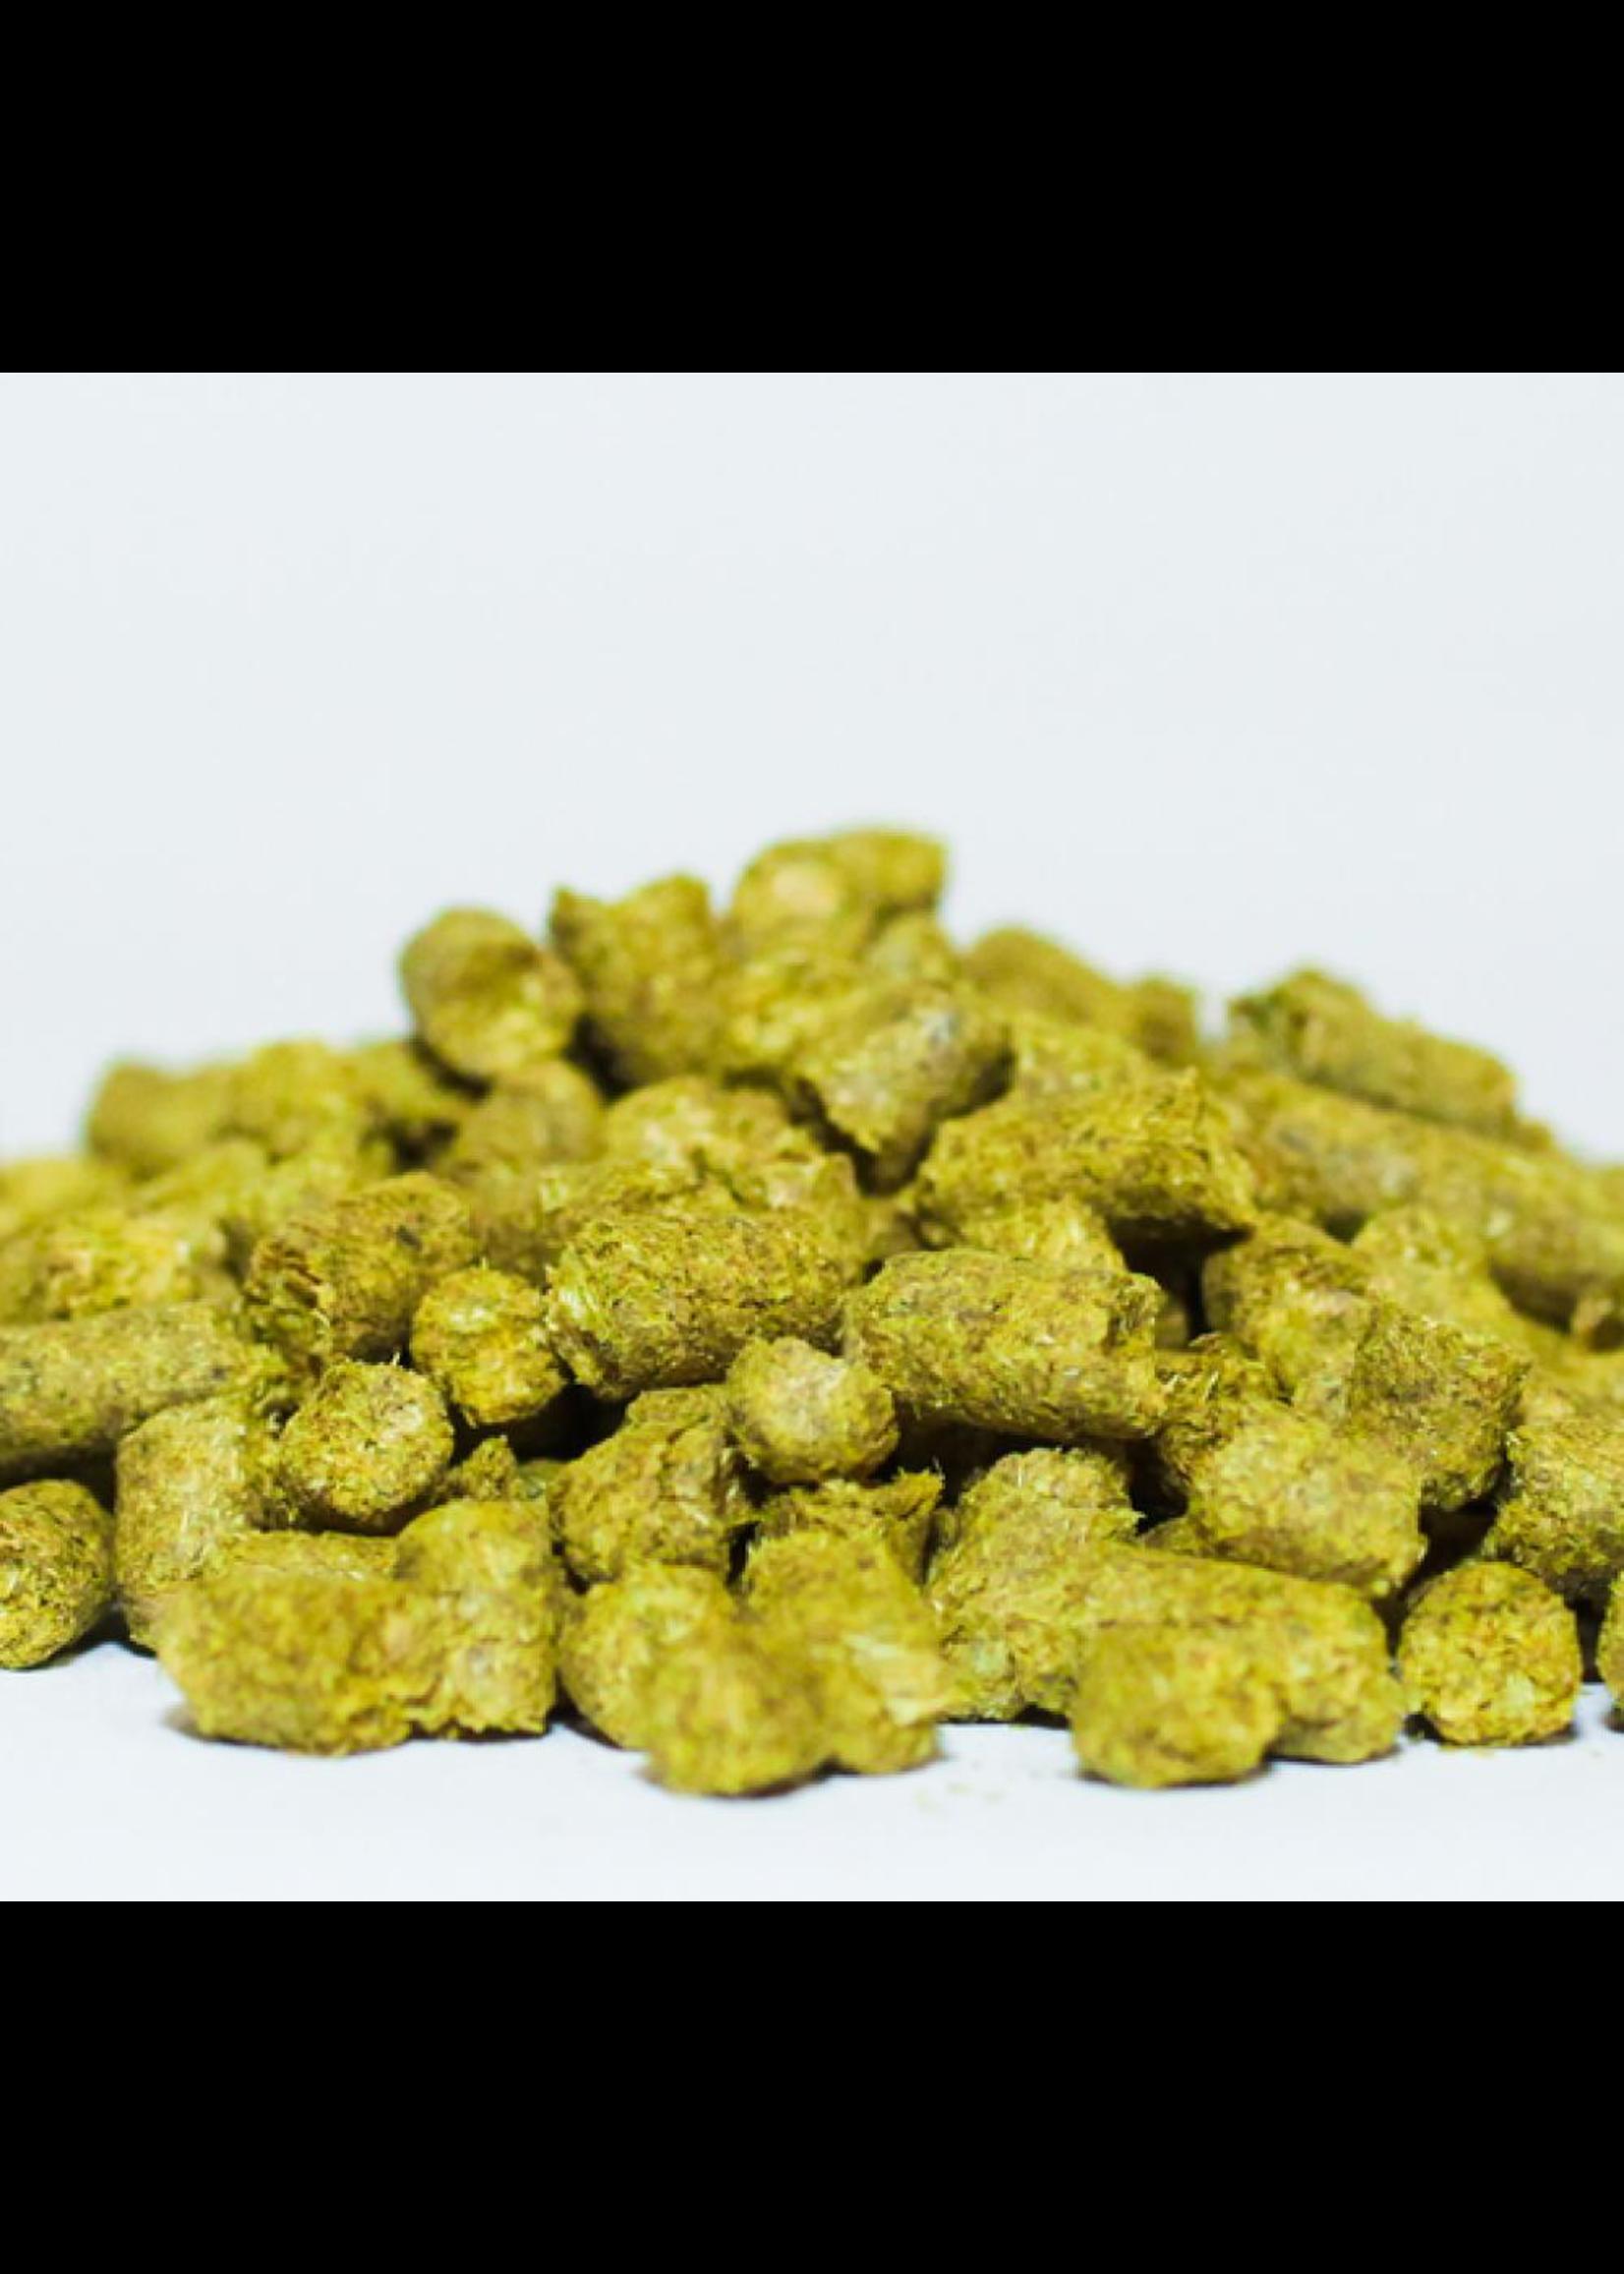 Hops Crystal Hops (US) - Pellets - 1 LB